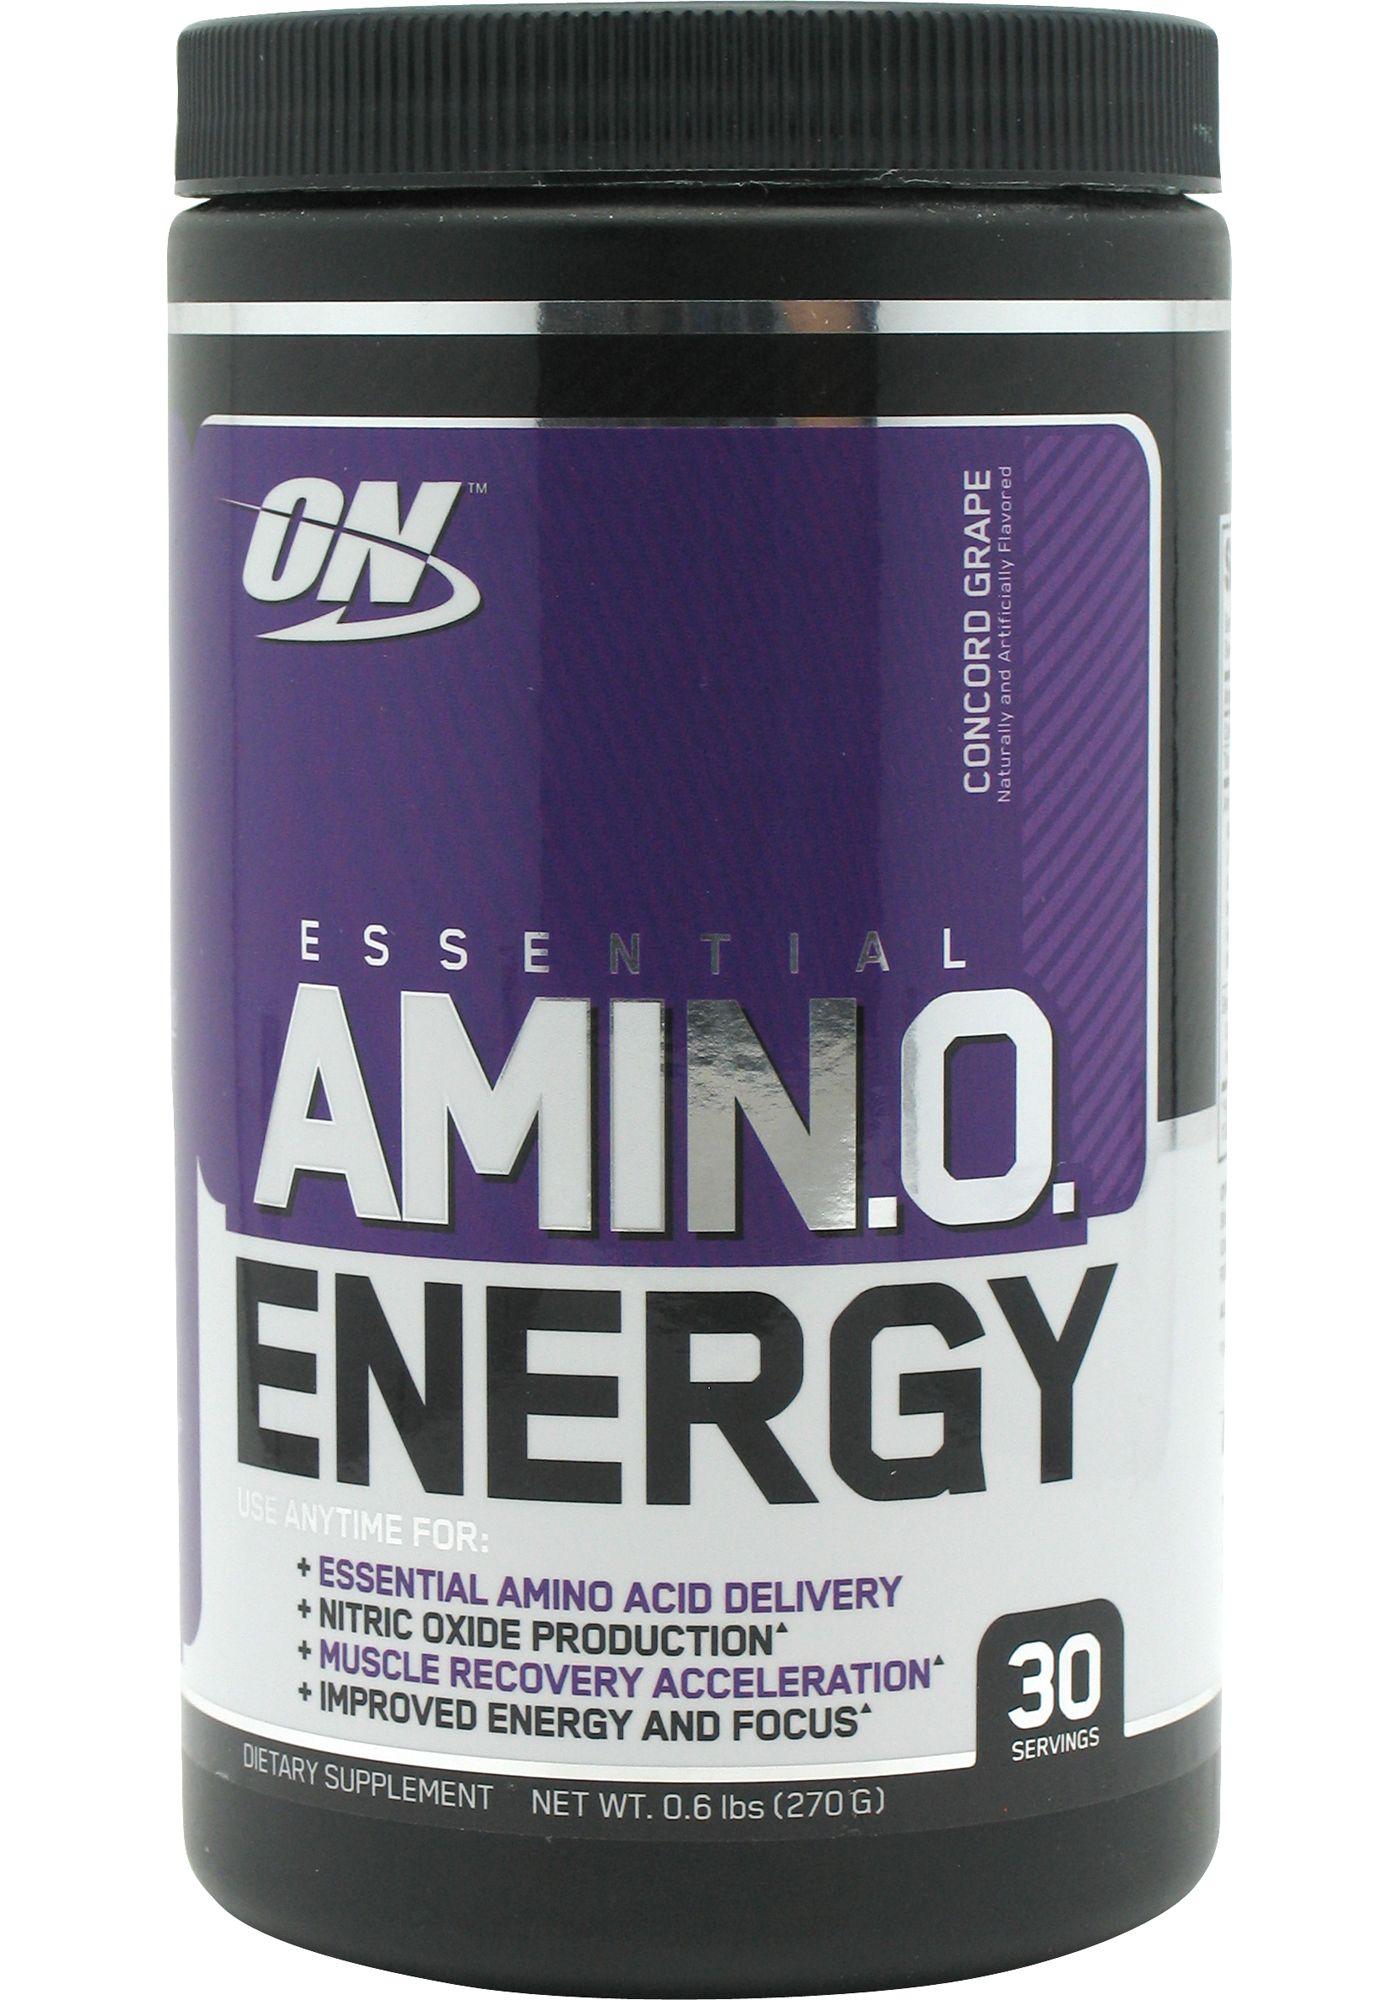 Optimum Nutrition Essential Amino Energy Grape 30 Servings